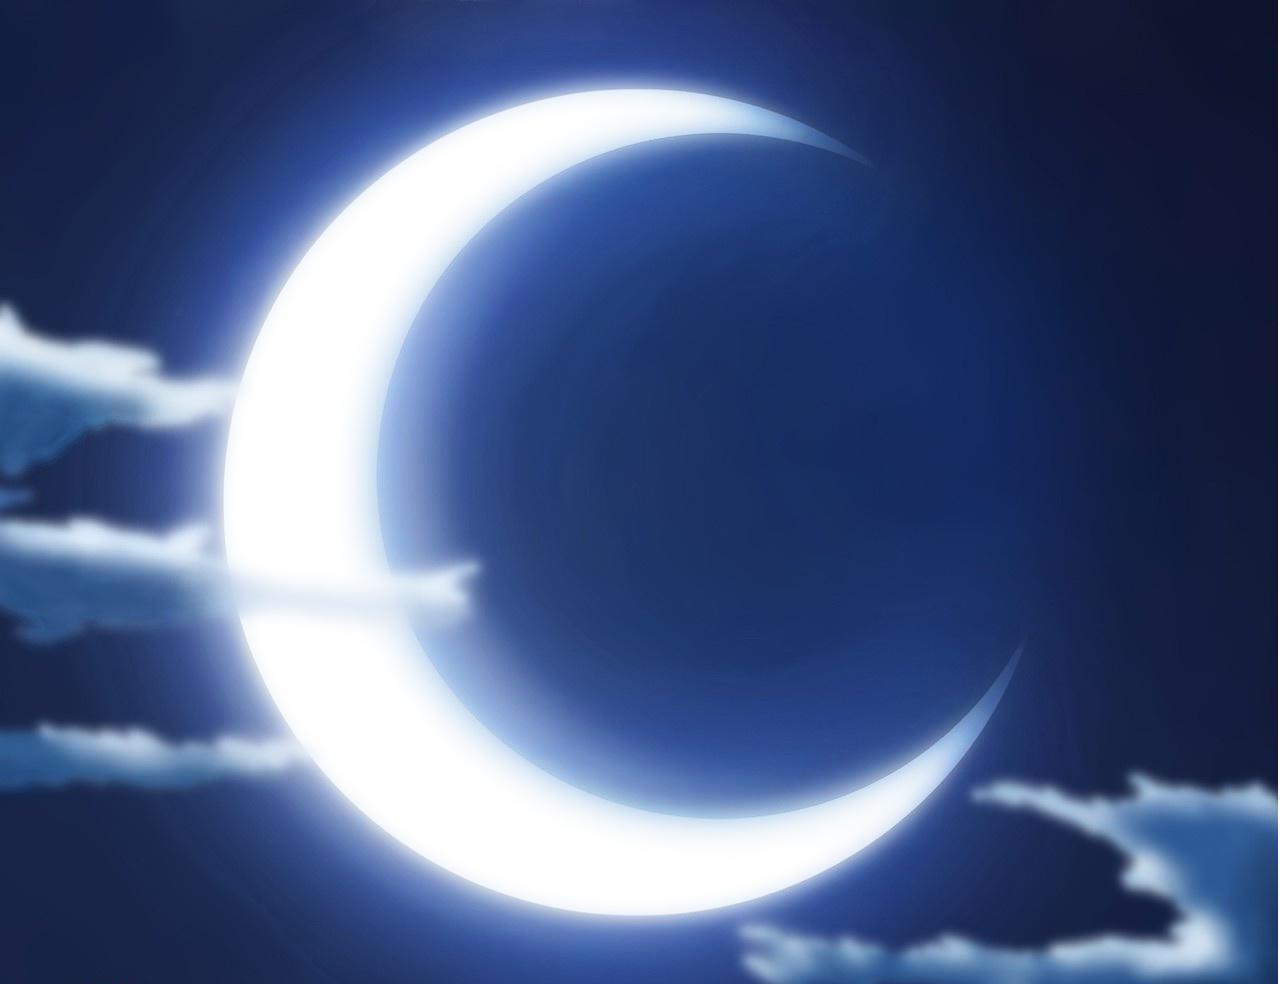 Ihmc public cmaps 2 for Cuarto menguante de la luna